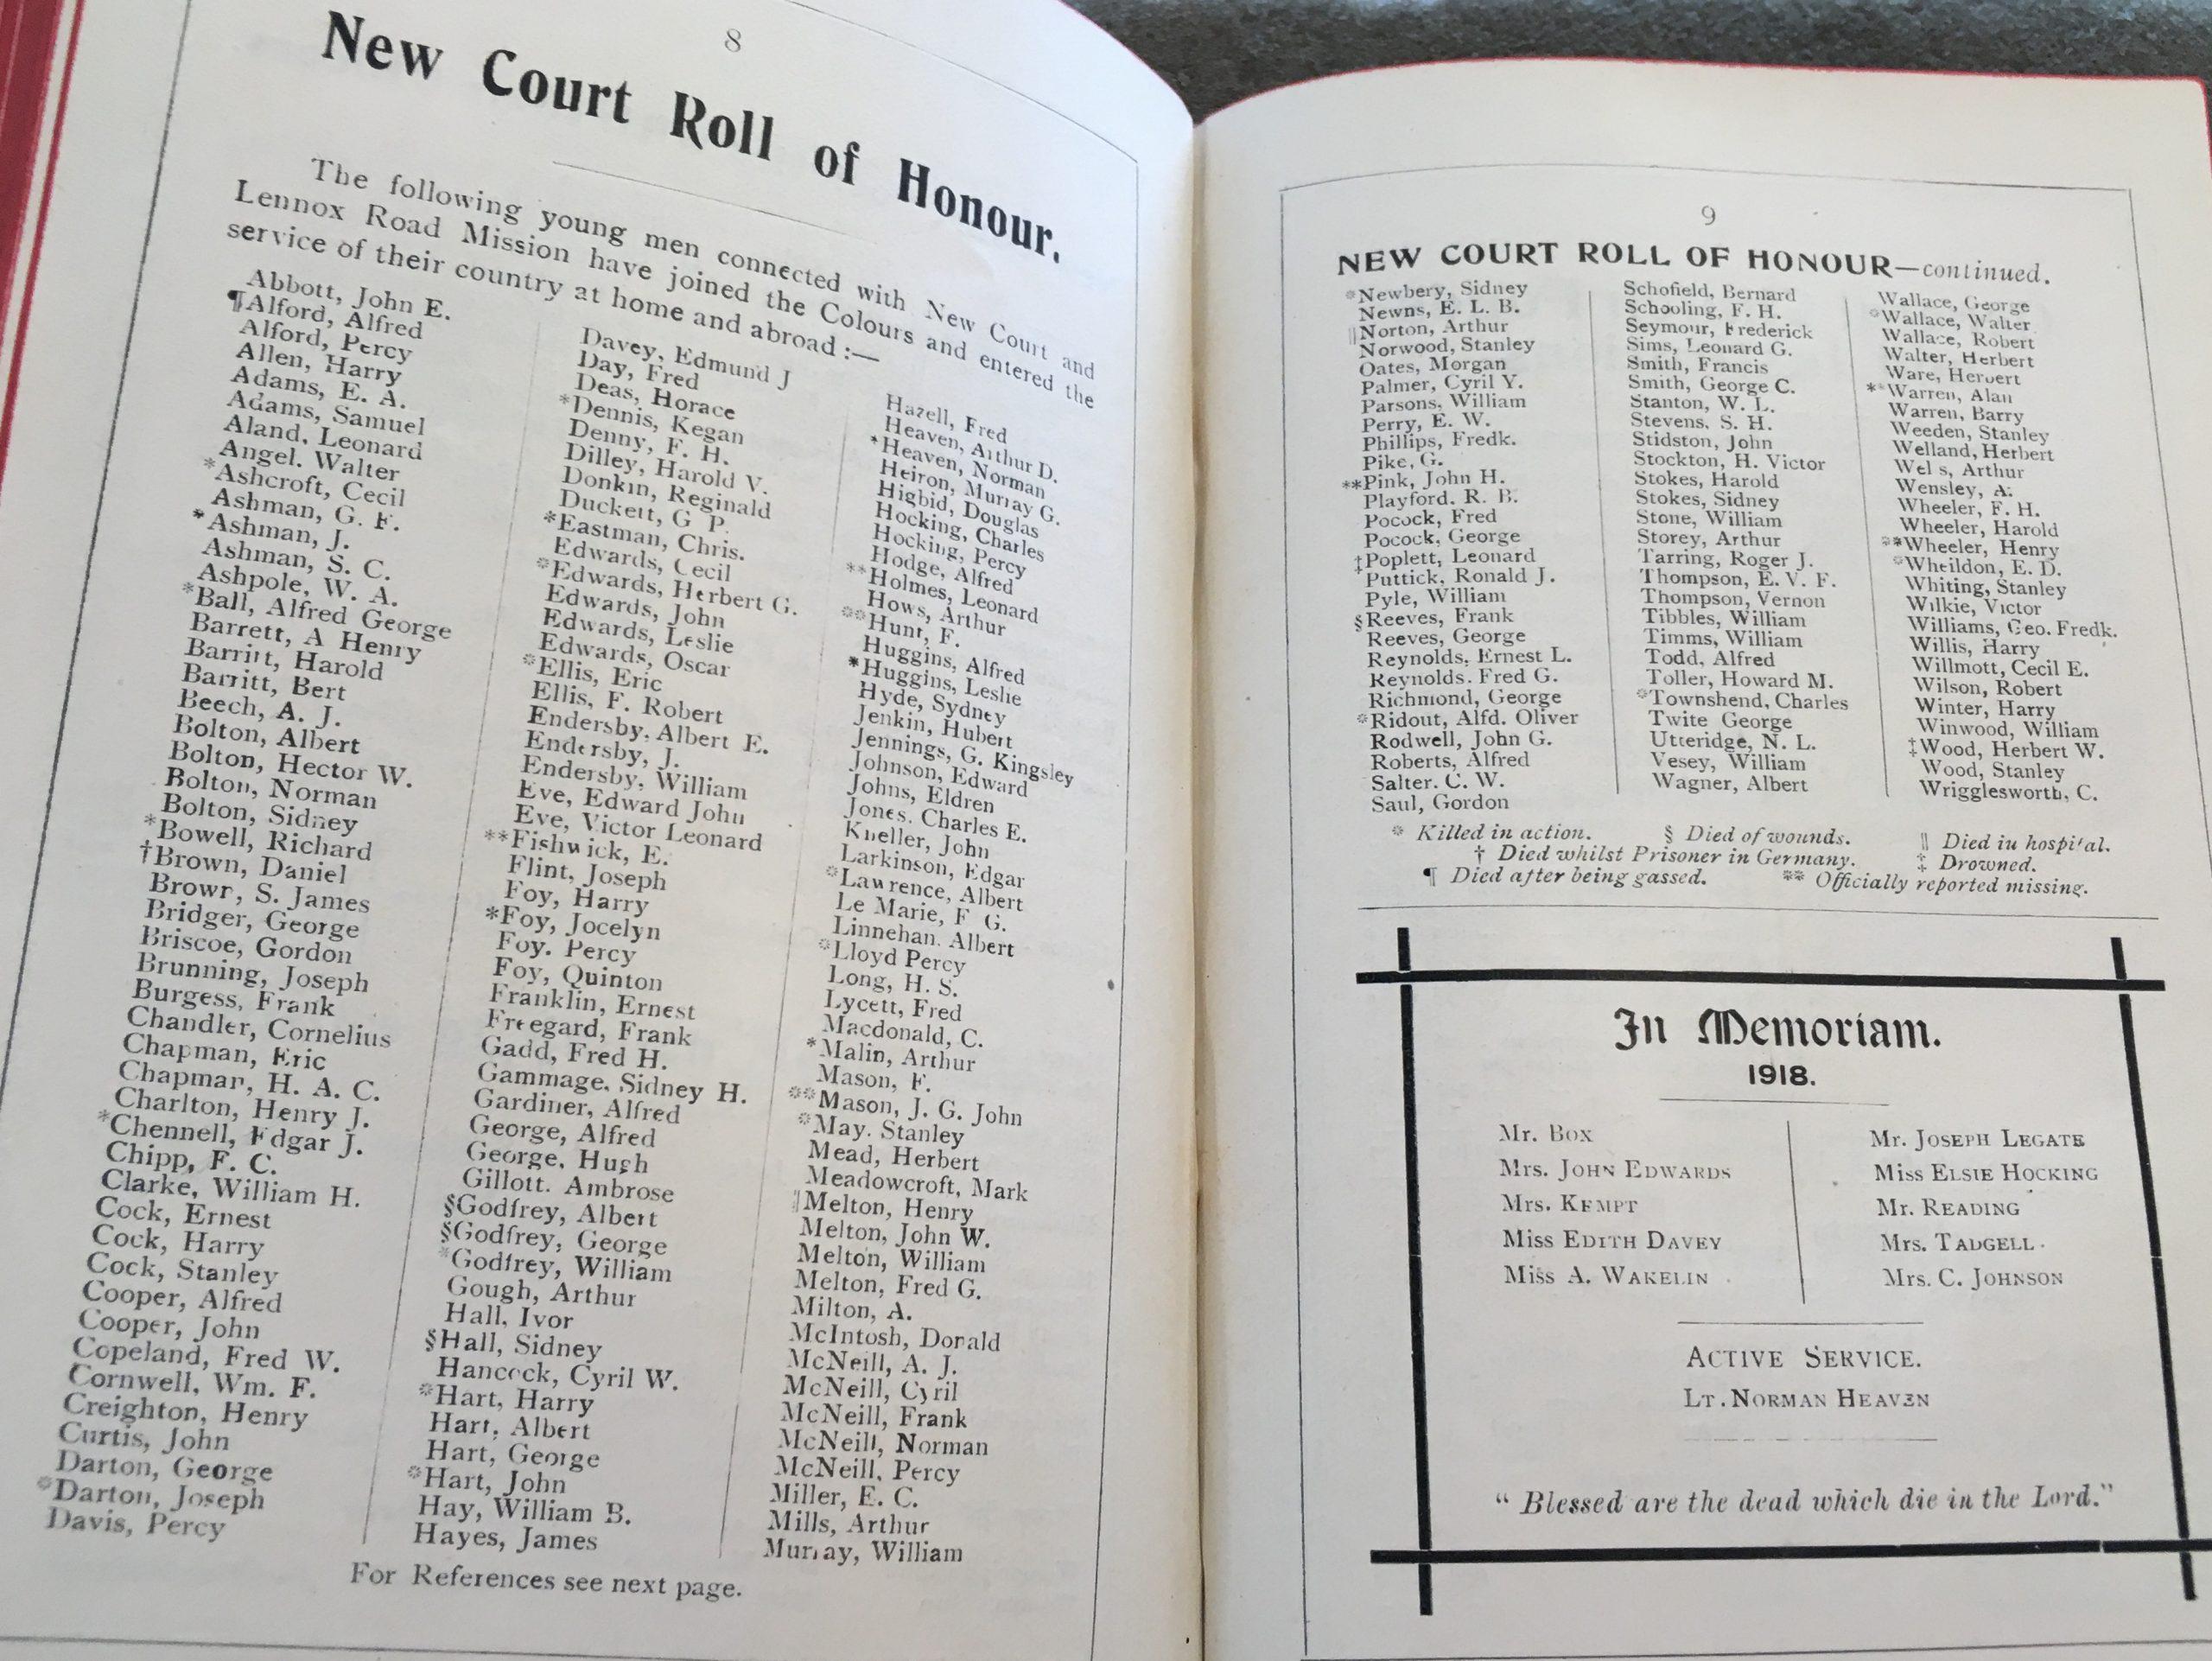 New Court Roll Of Honour, Church Manual 1919 Volume, London Metropolitan Archives